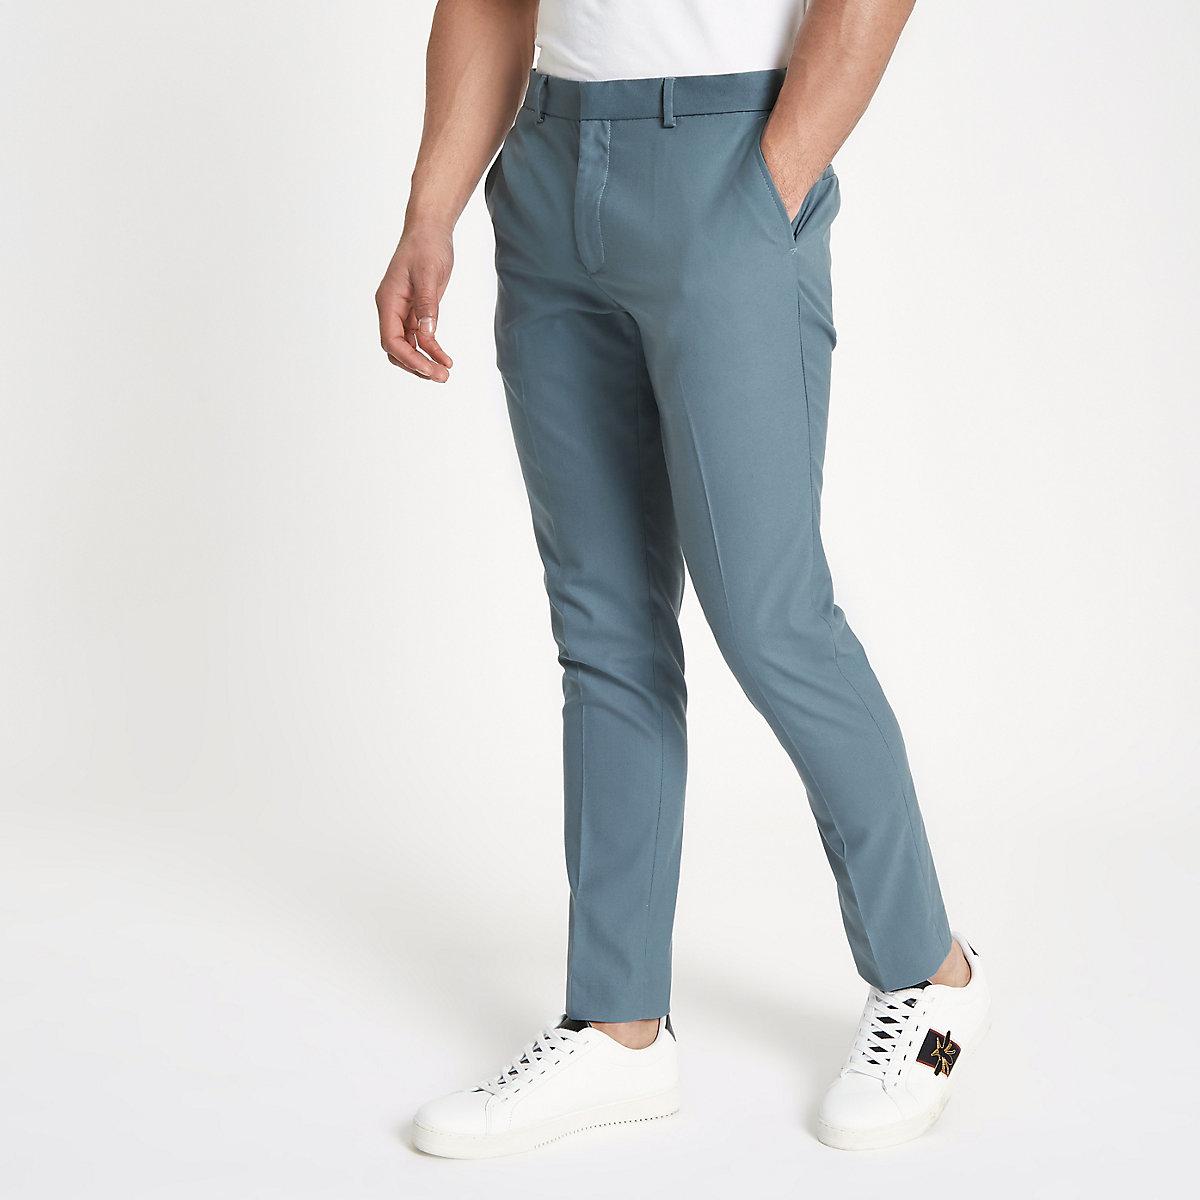 Blue skinny smart pants